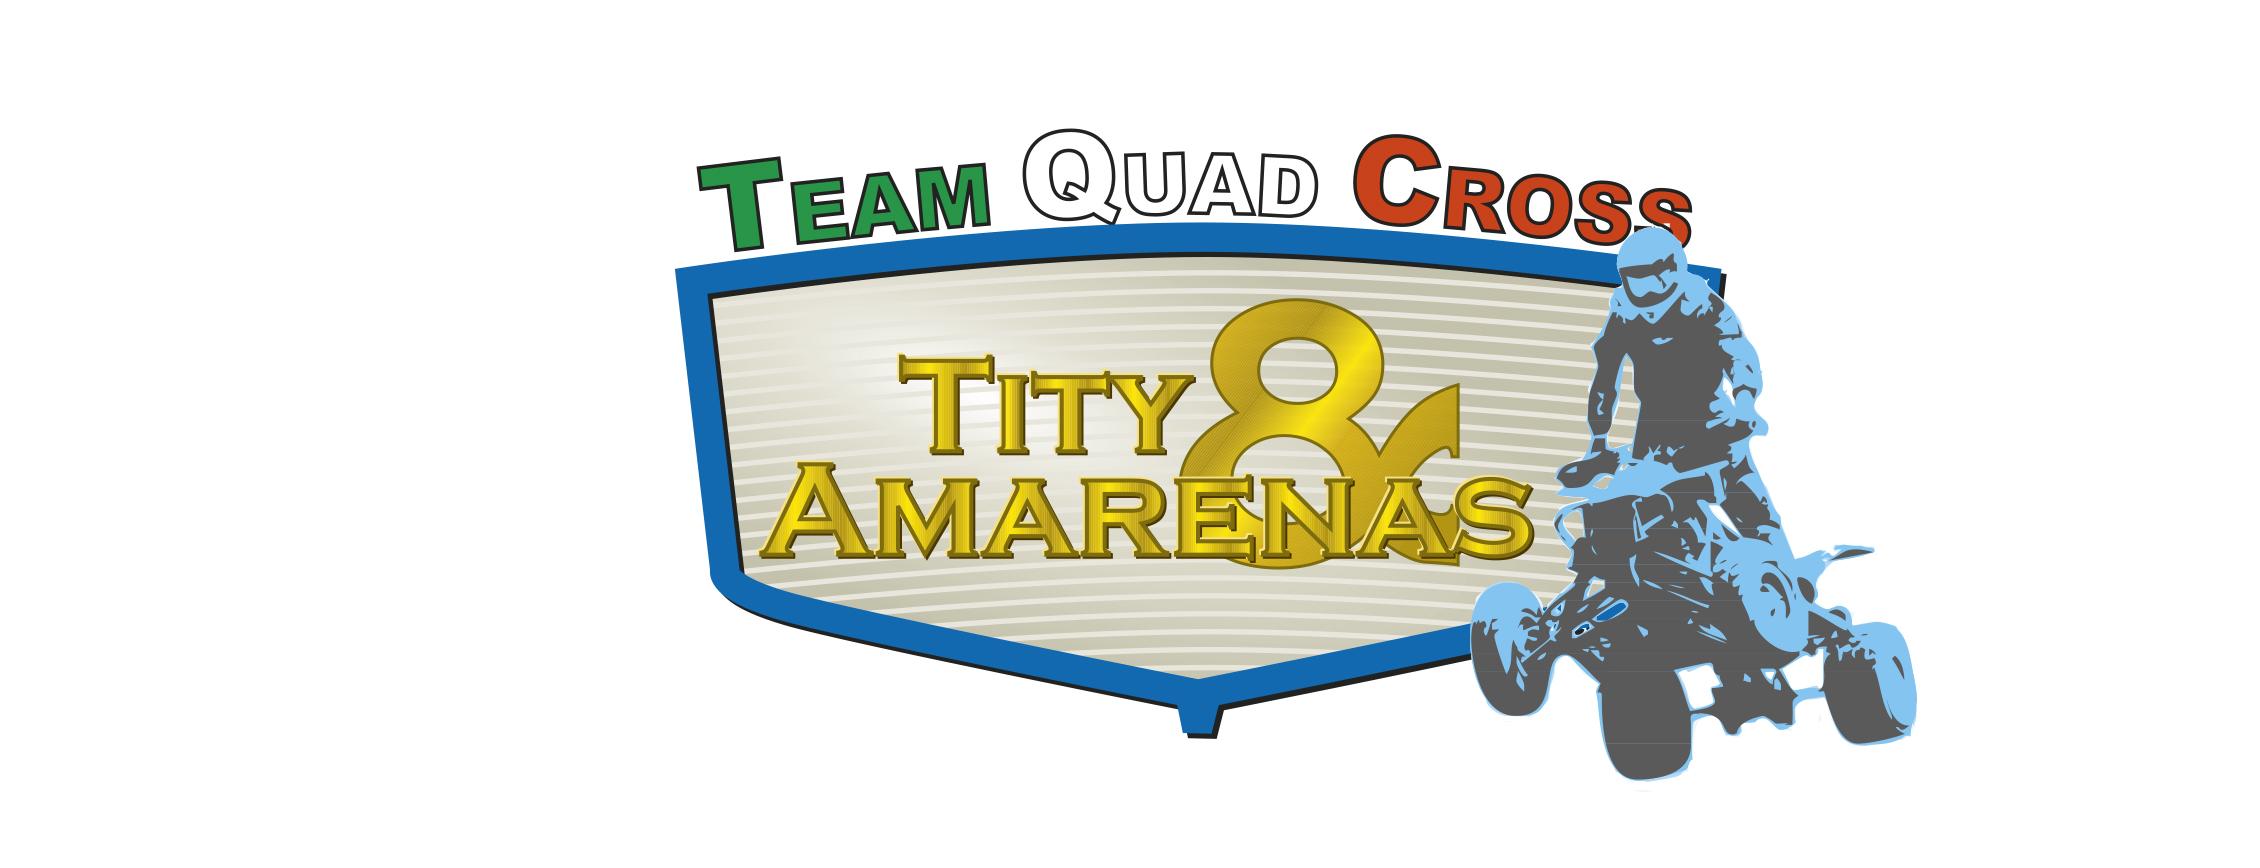 Tity & Amarenas logo